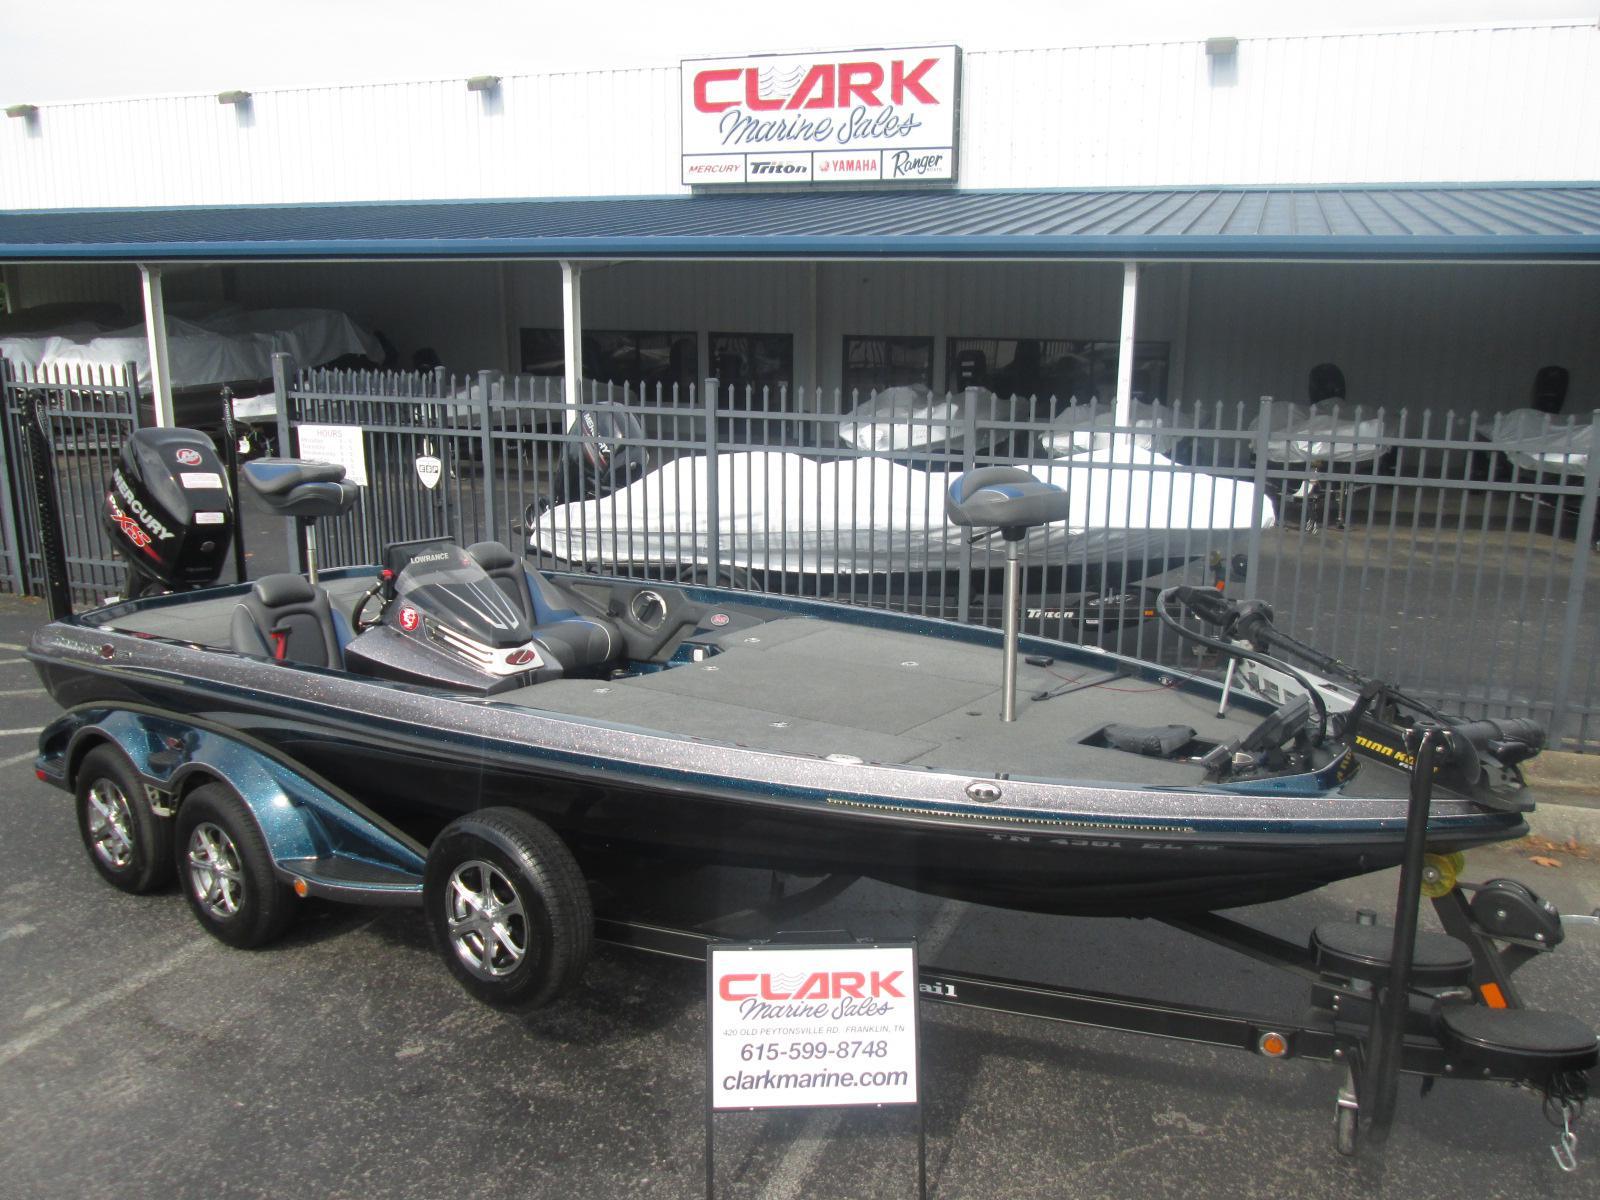 Inventory Clark Marine Sales, LLC Franklin, TN (888) 497-2373